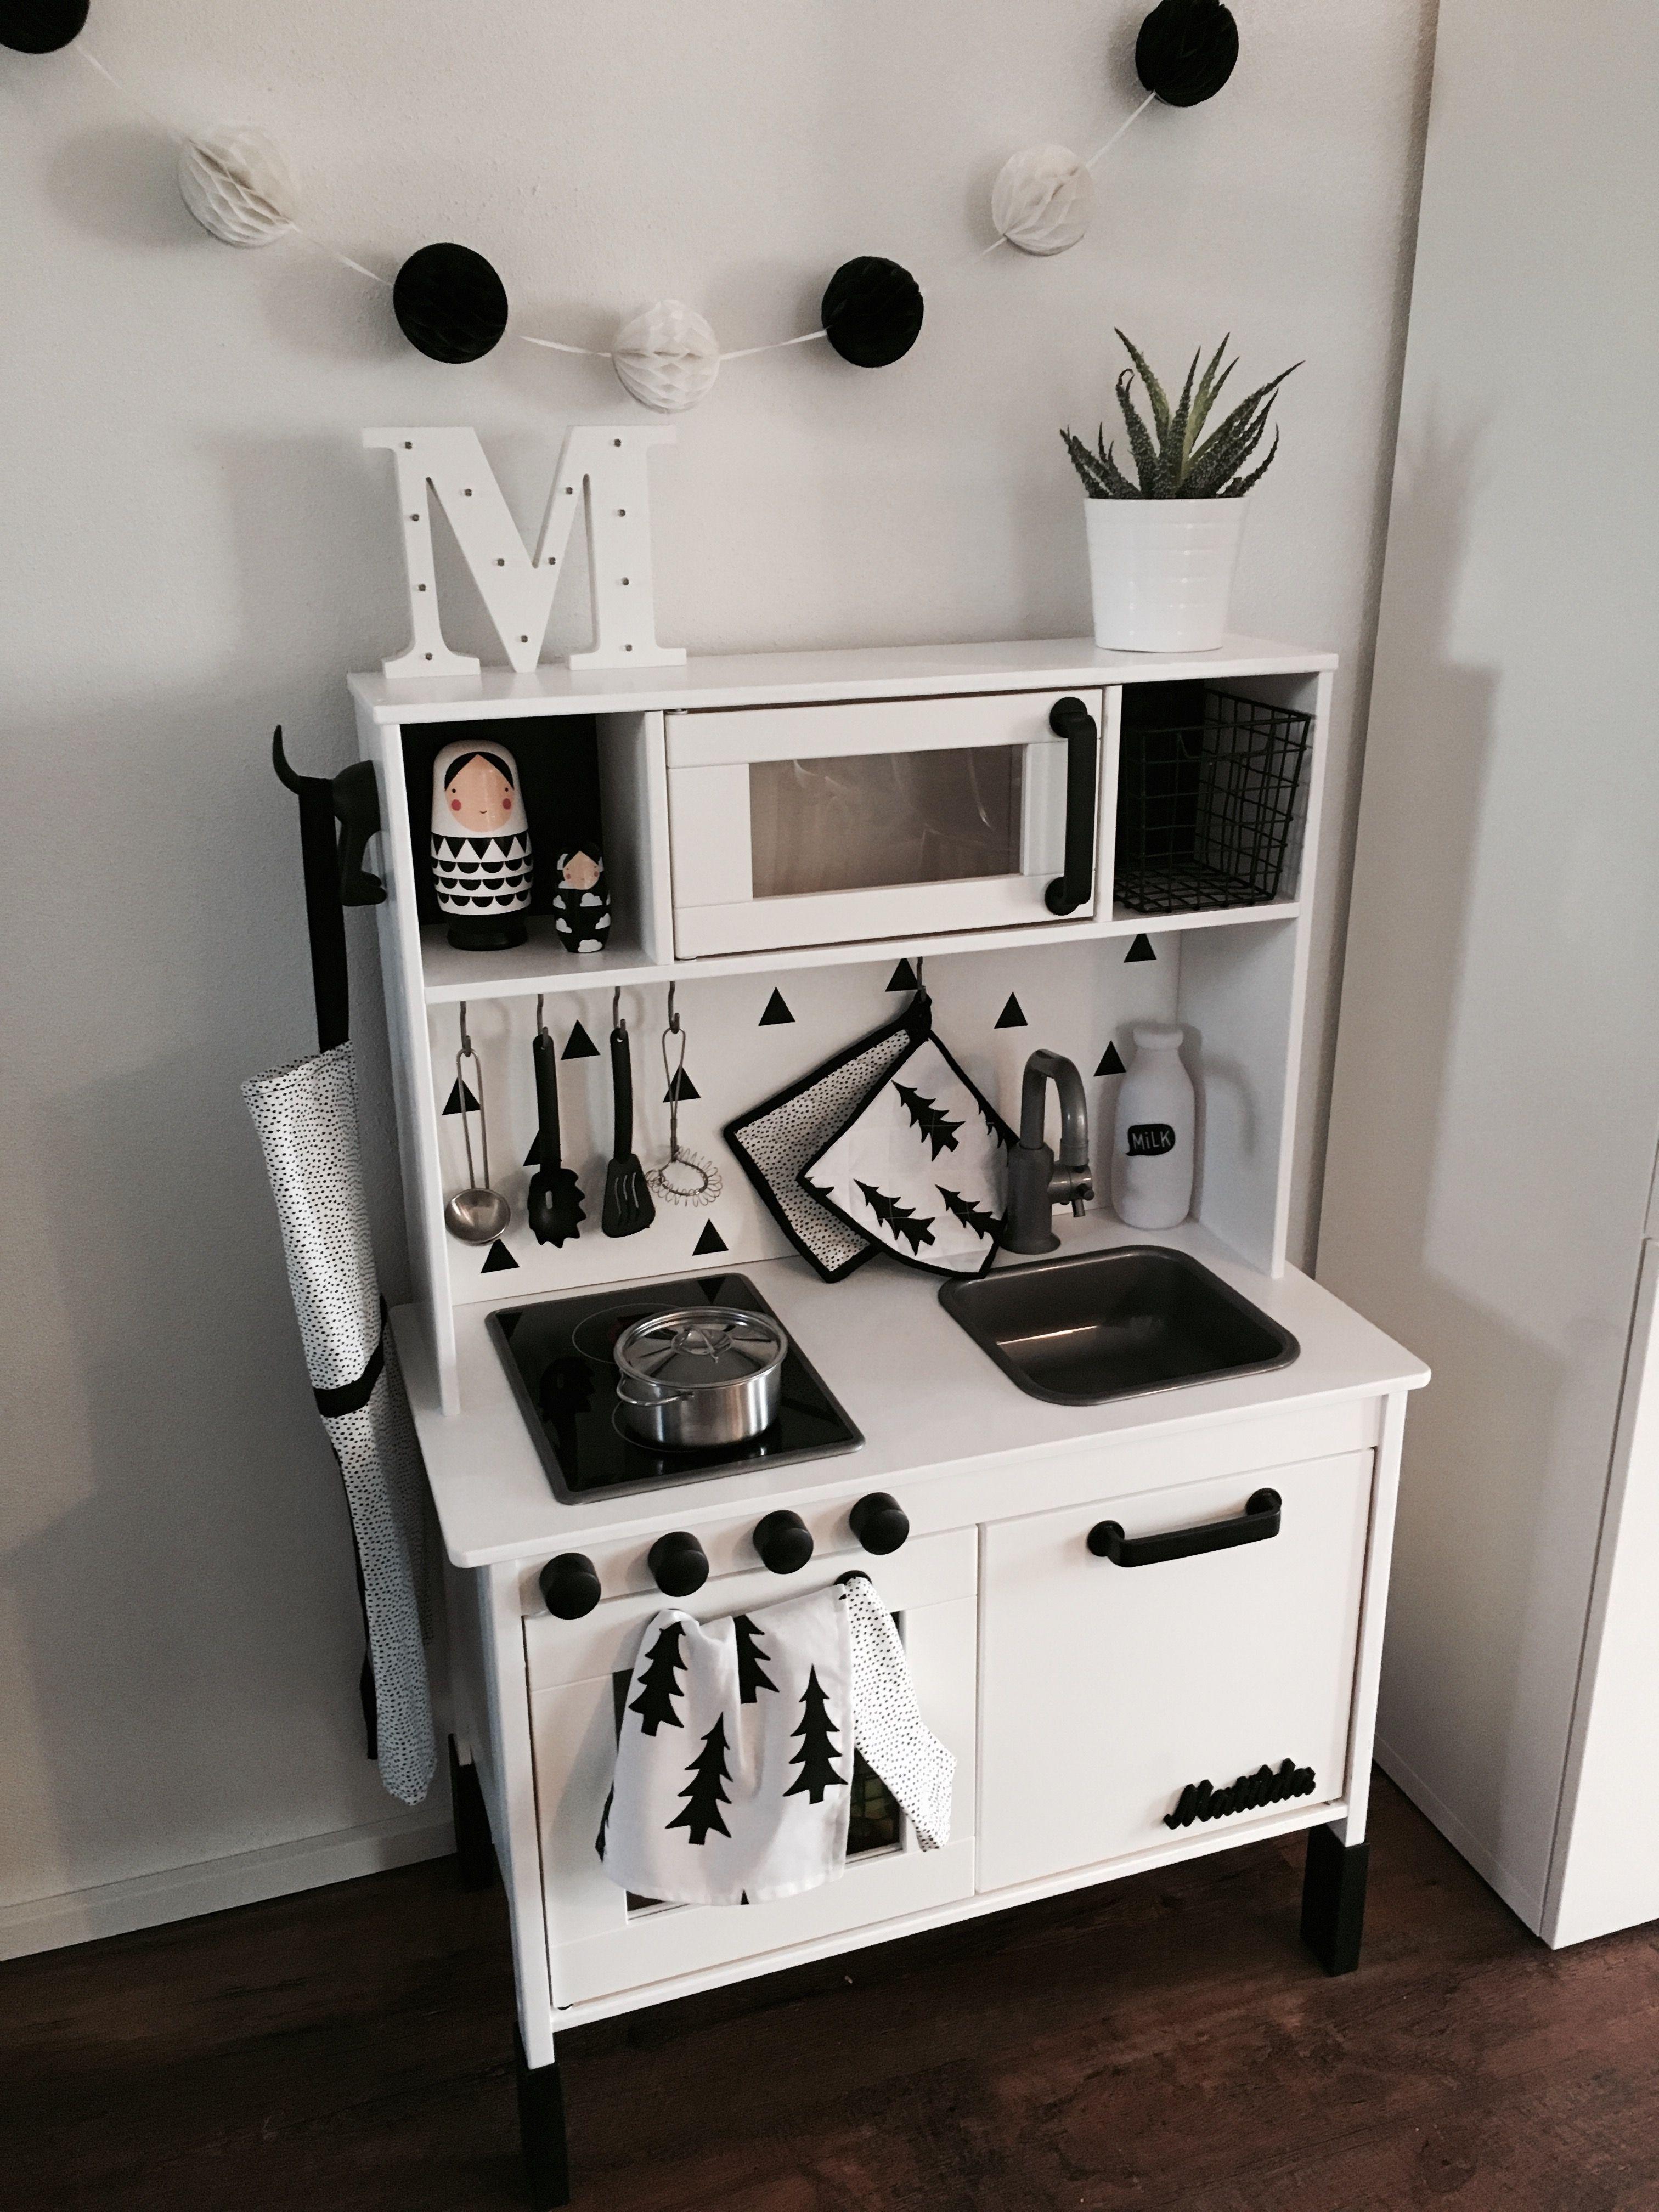 ikea duktig k che spielk che hack triangele geometrie black white home ikea k che. Black Bedroom Furniture Sets. Home Design Ideas